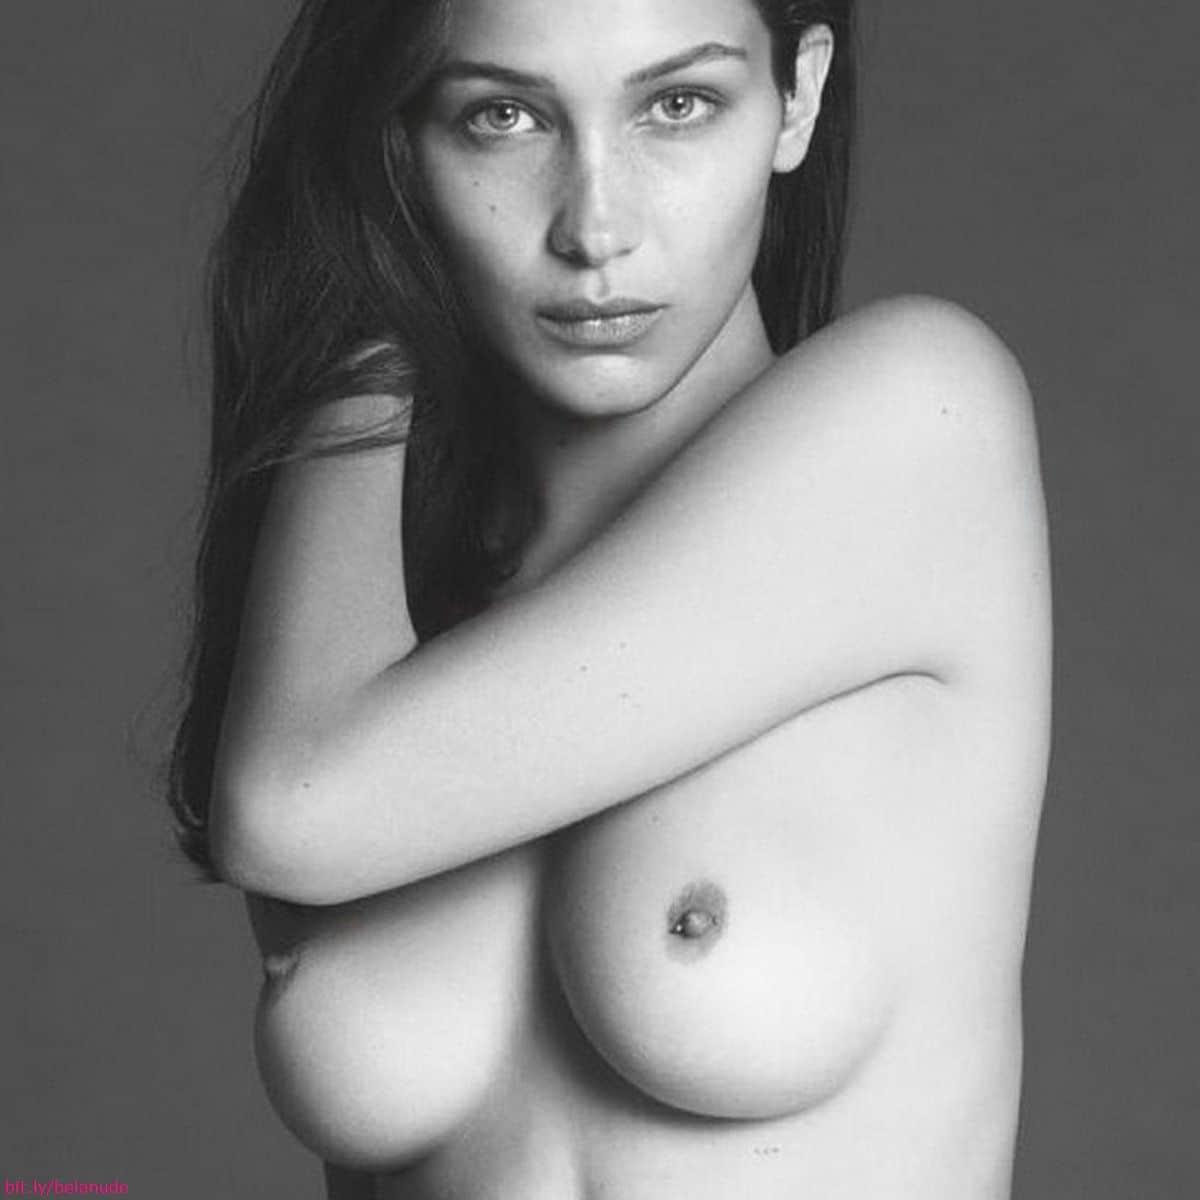 Bella hadid topless nude pic gigi hadid - 2019 year